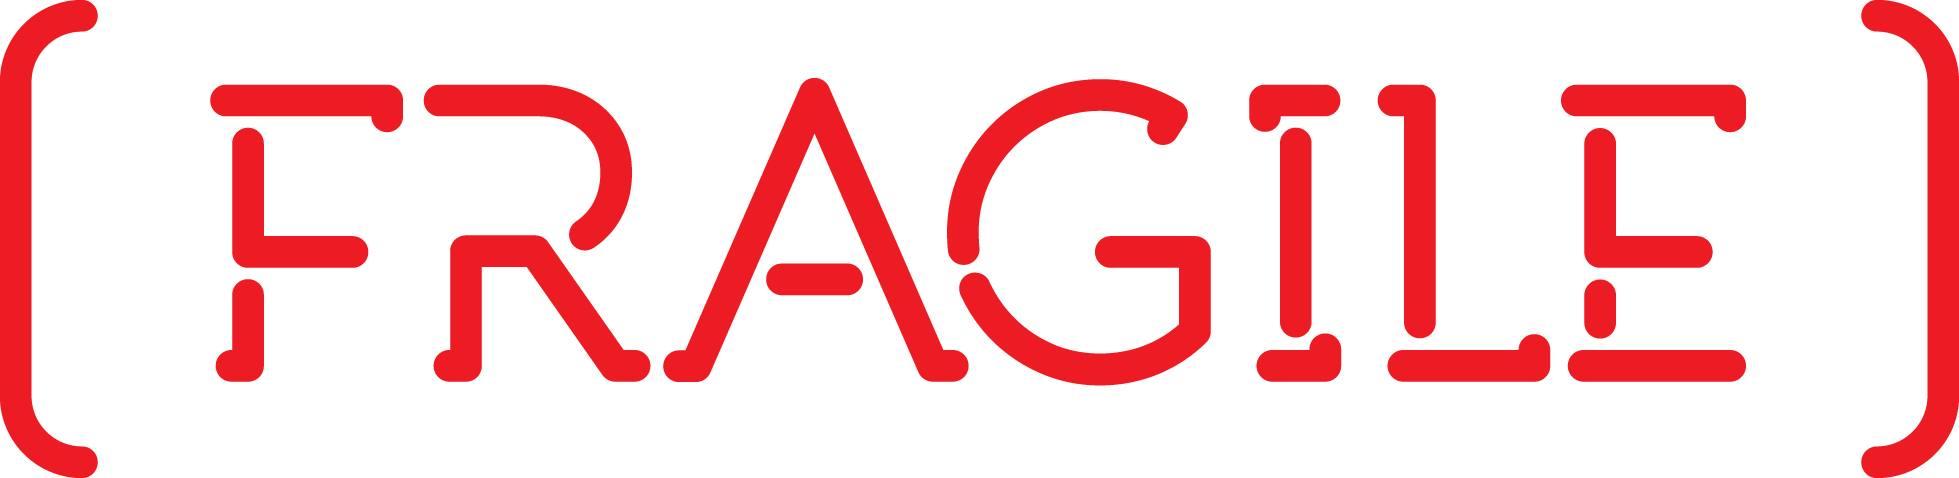 Fragilemag | Ηχογραφώντας το βουητό της πόλης